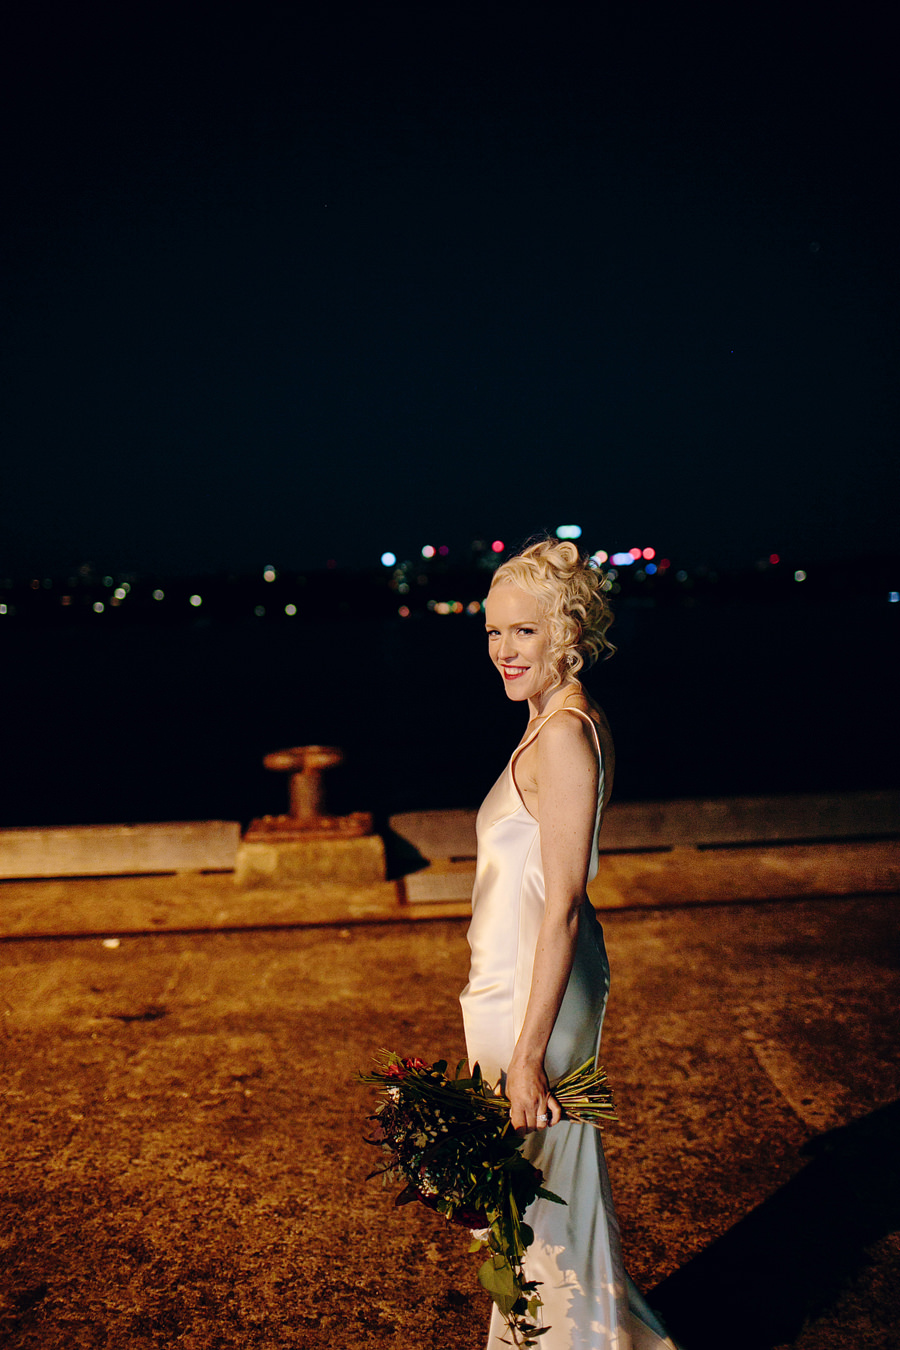 Sydney Wedding Photography: Portraits